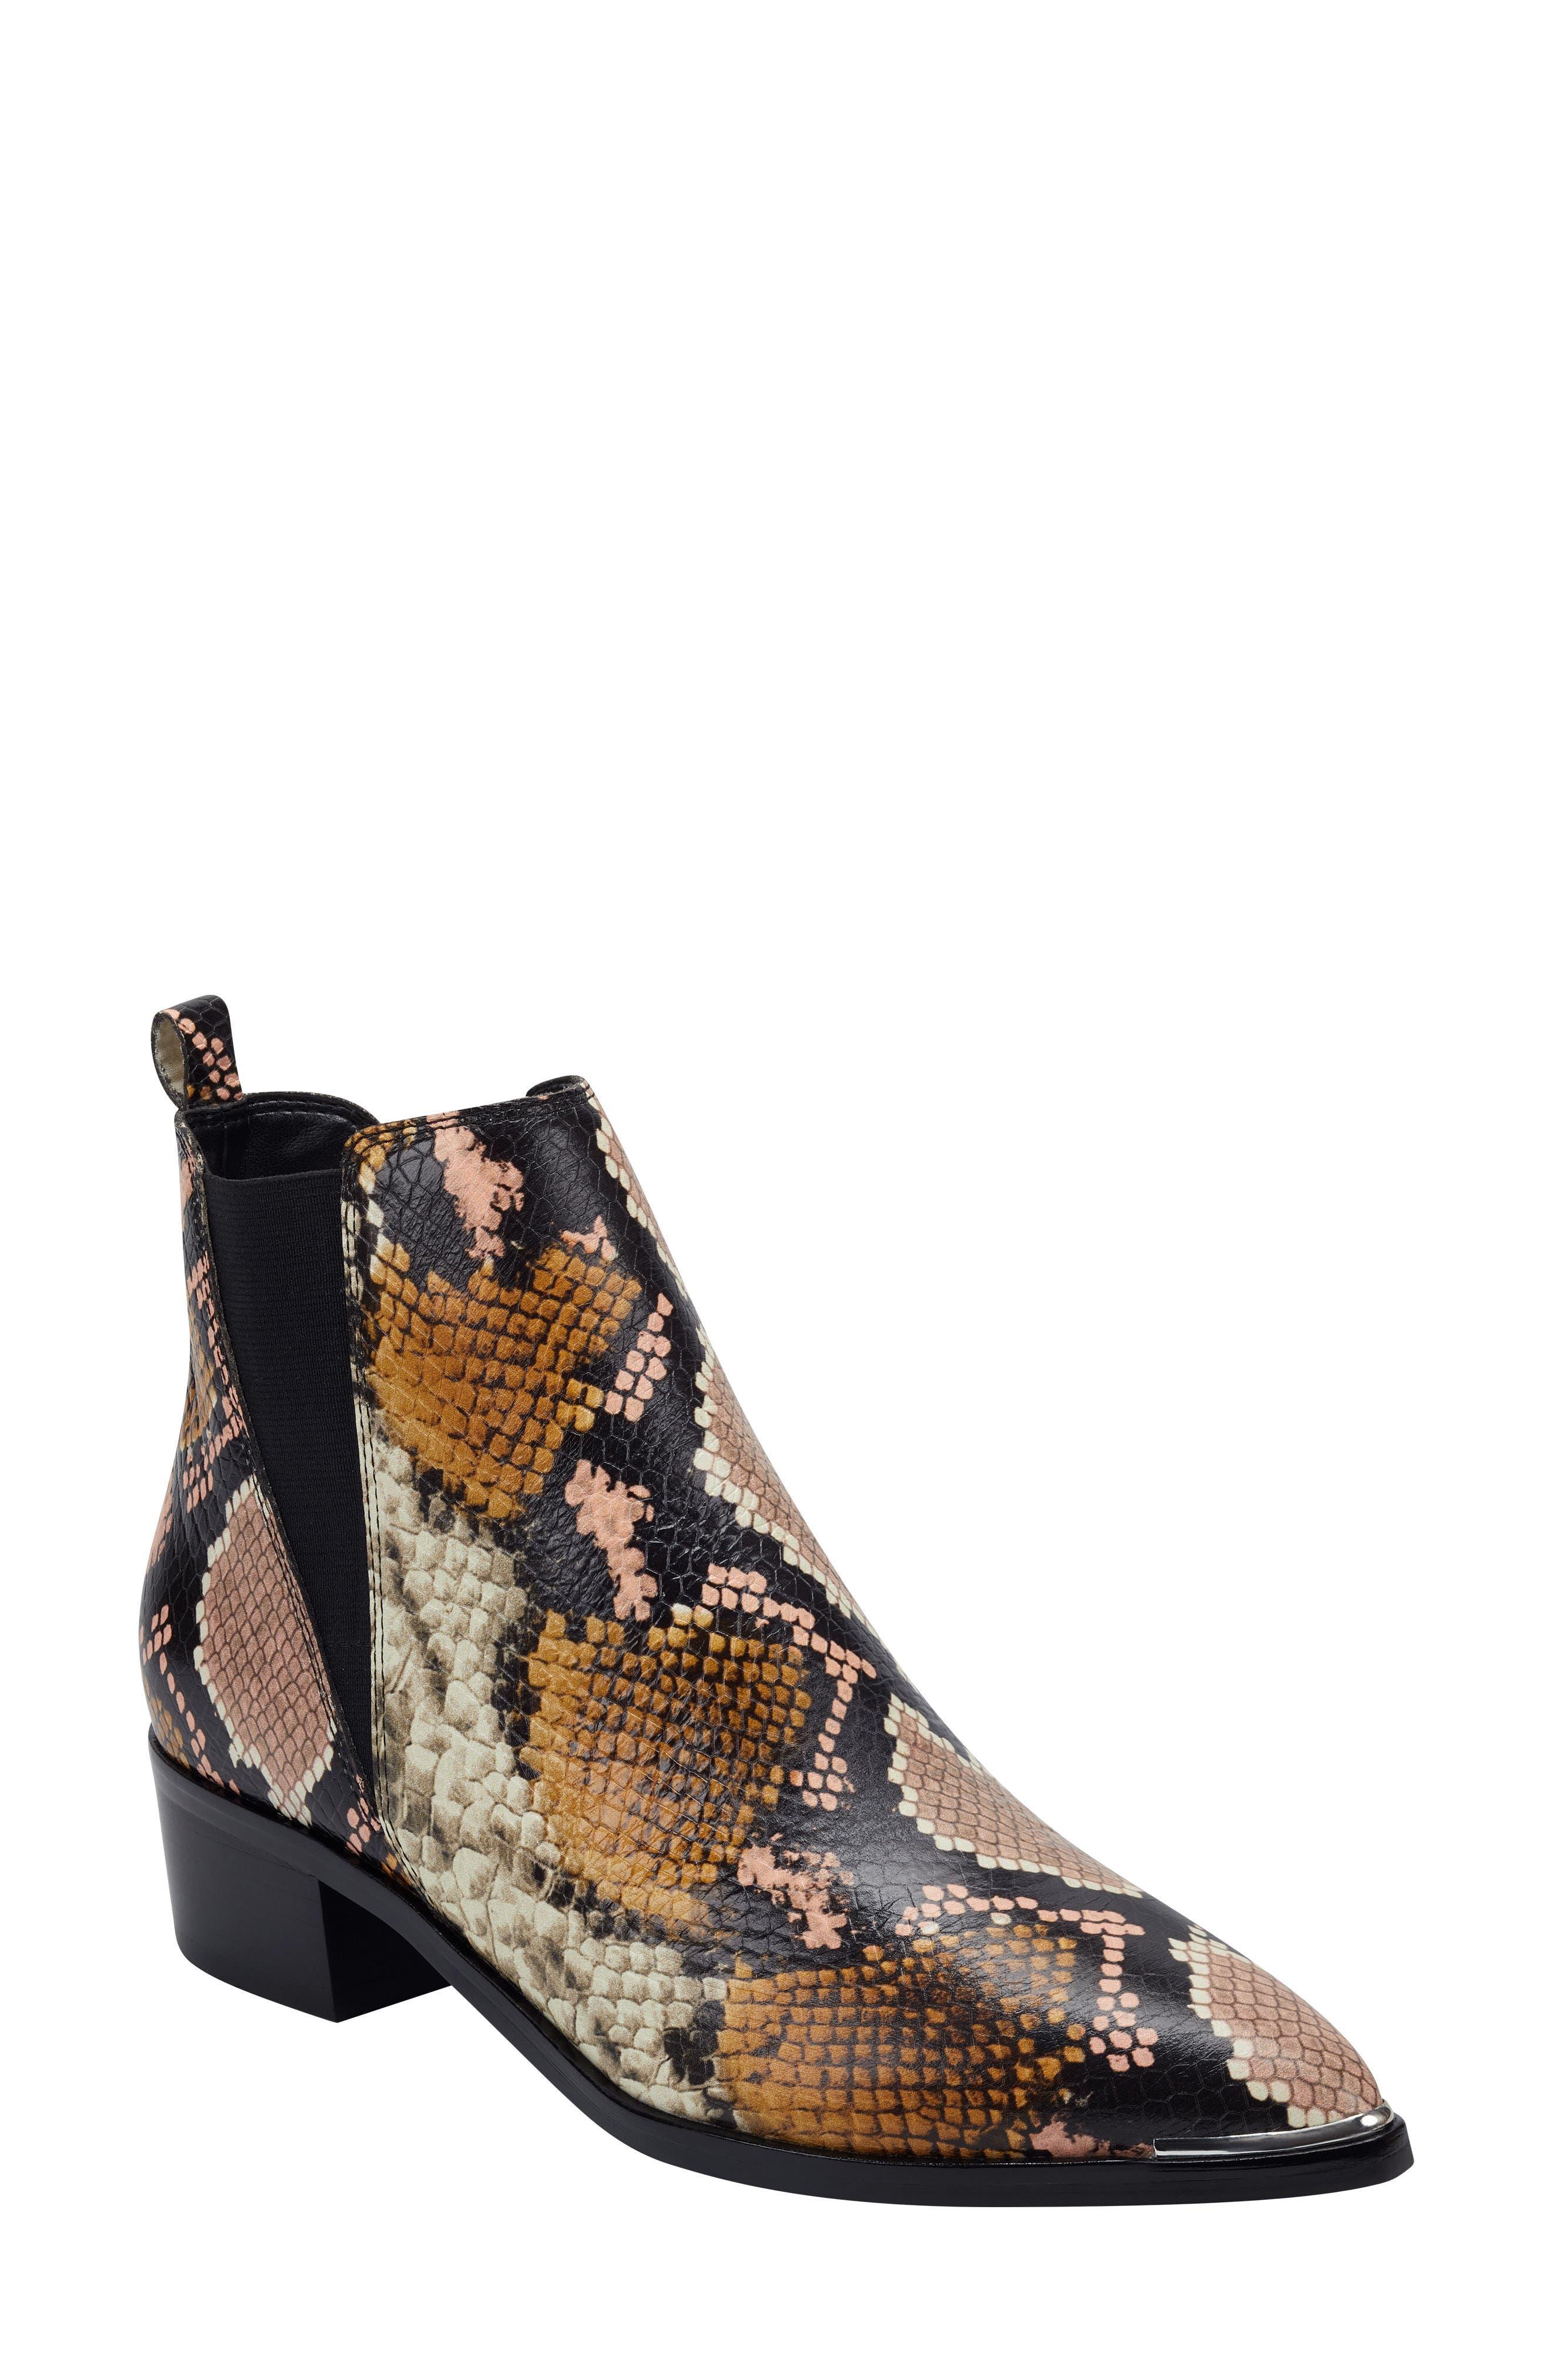 Women's Marc Fisher LTD Snake Print Shoes   Nordstrom